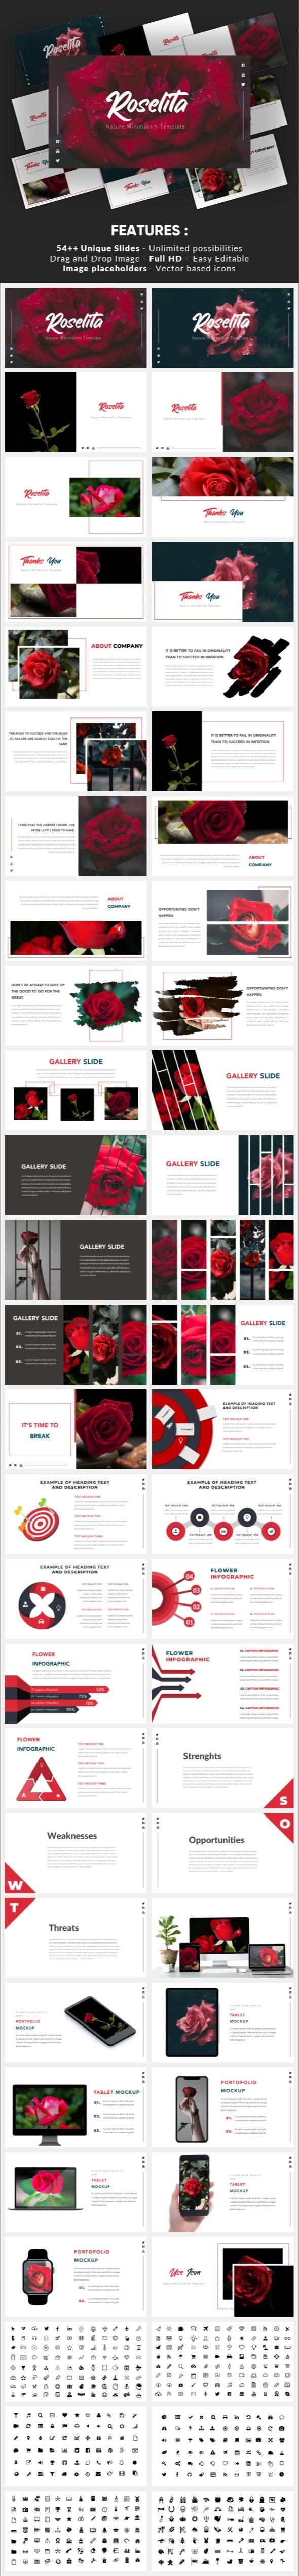 Roselita - Nature Minimalism Powerpoint Template - Nature PowerPoint Templates